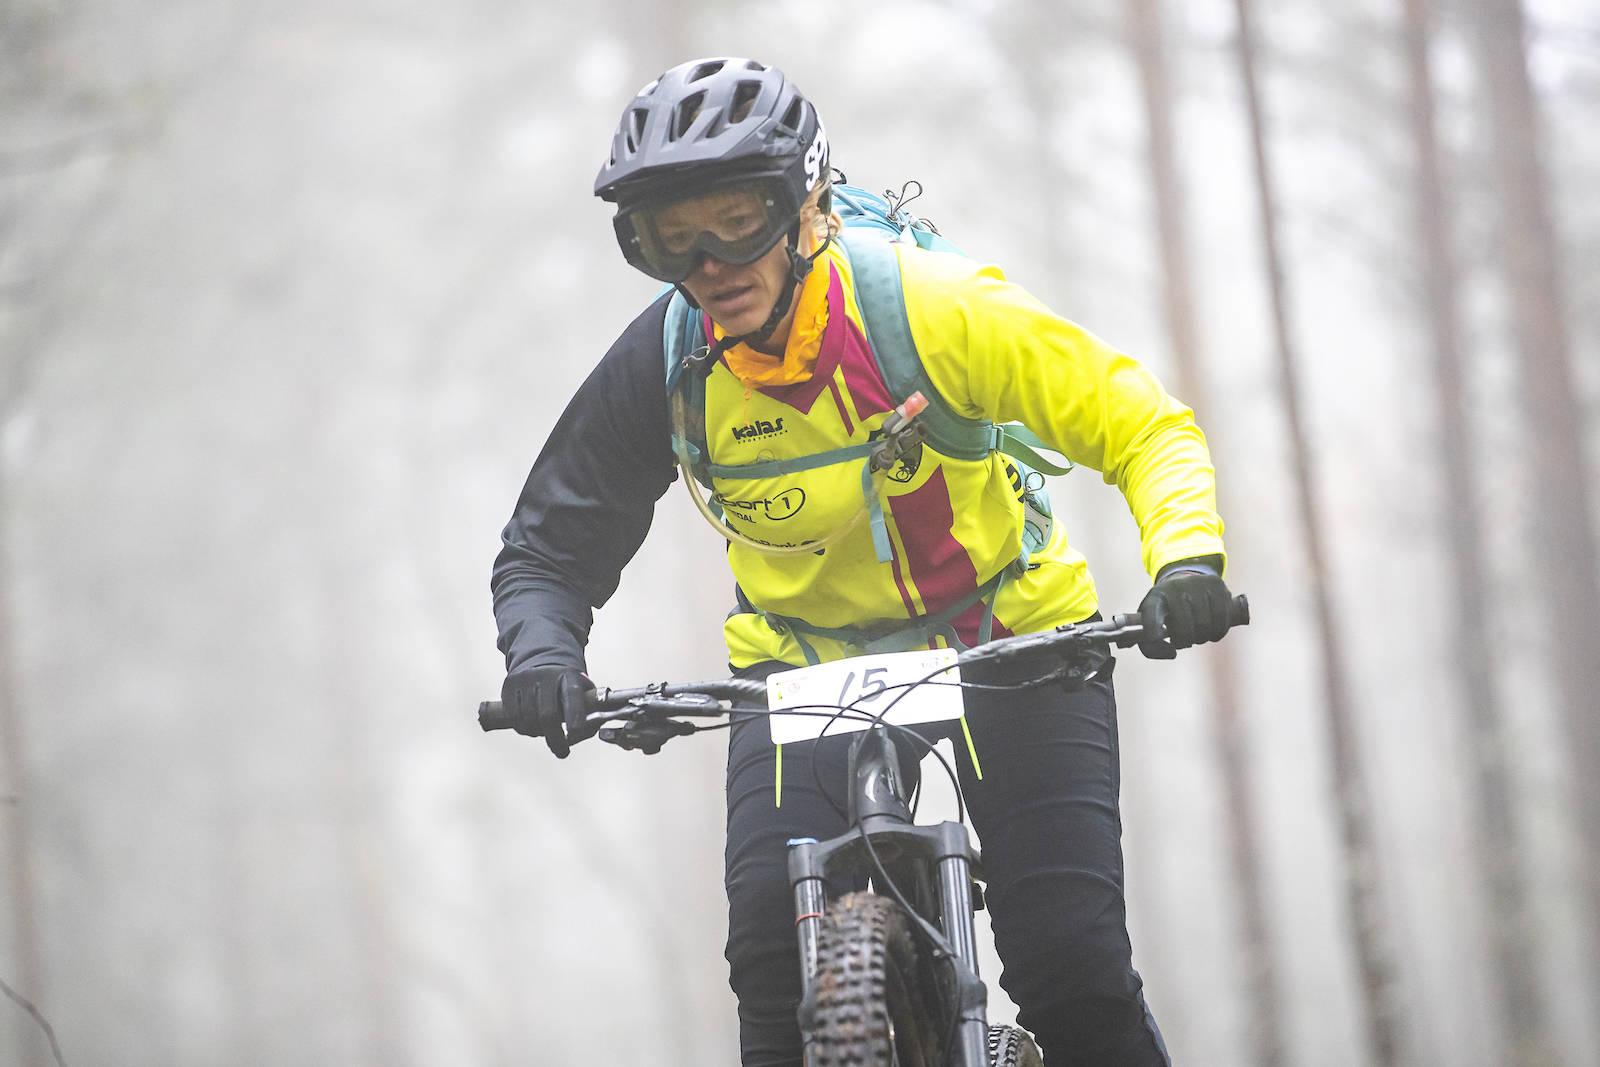 Kine Lidsheim fra Nittedal CK tok tredjeplass sammenlagt i Østafjells-serien.  Foto: Pål Westgaard